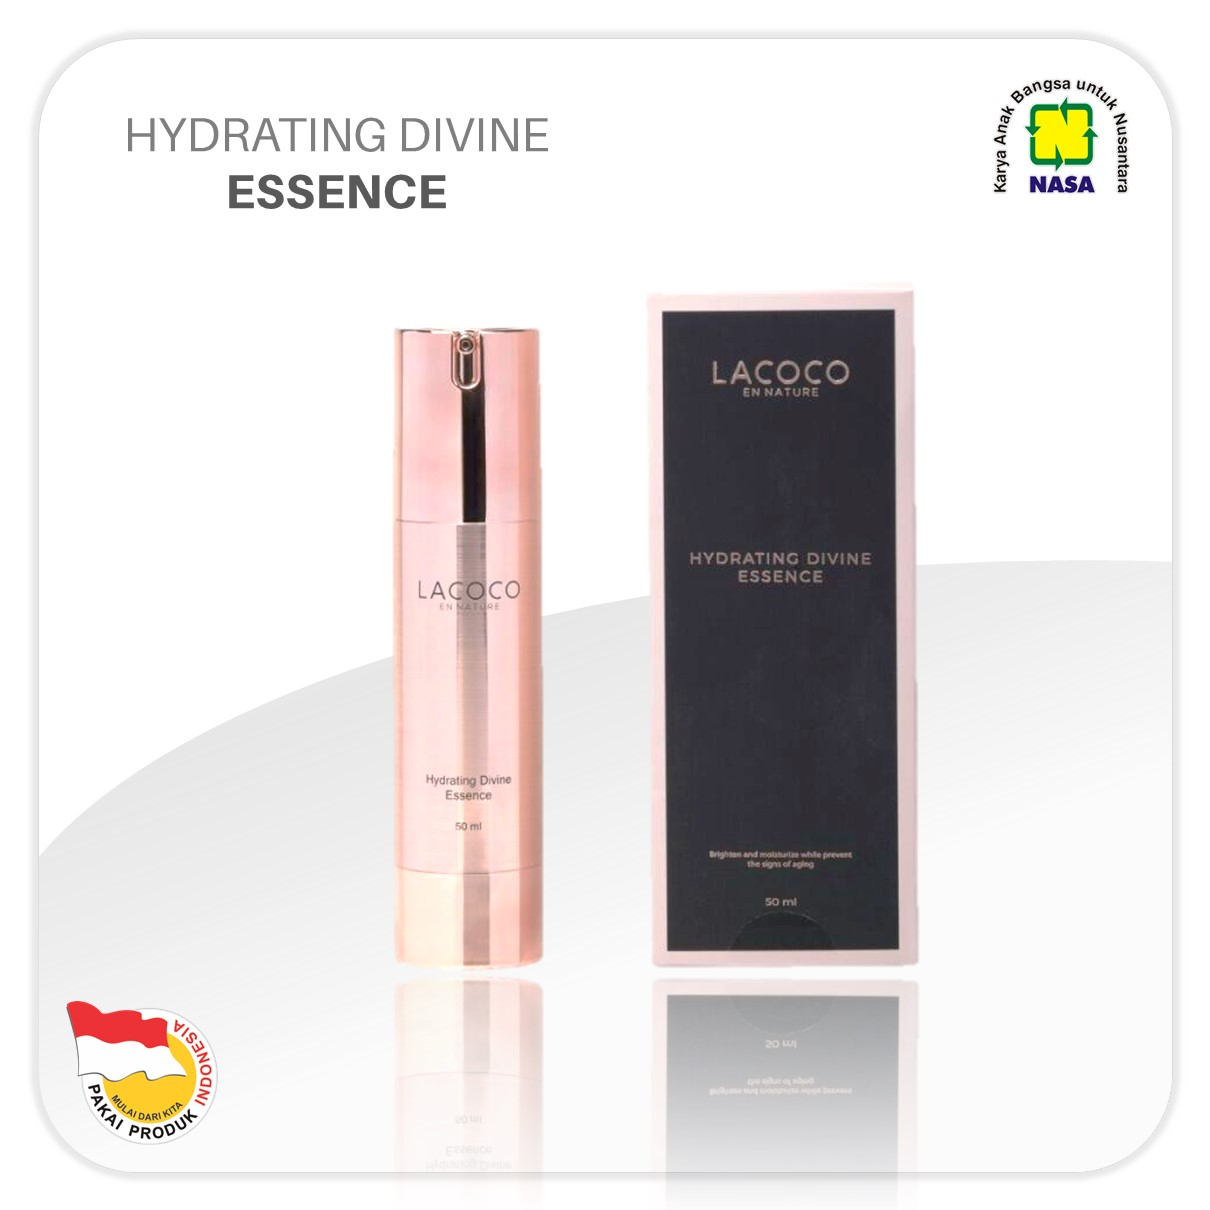 Lacoco Hydrating Divine Essence